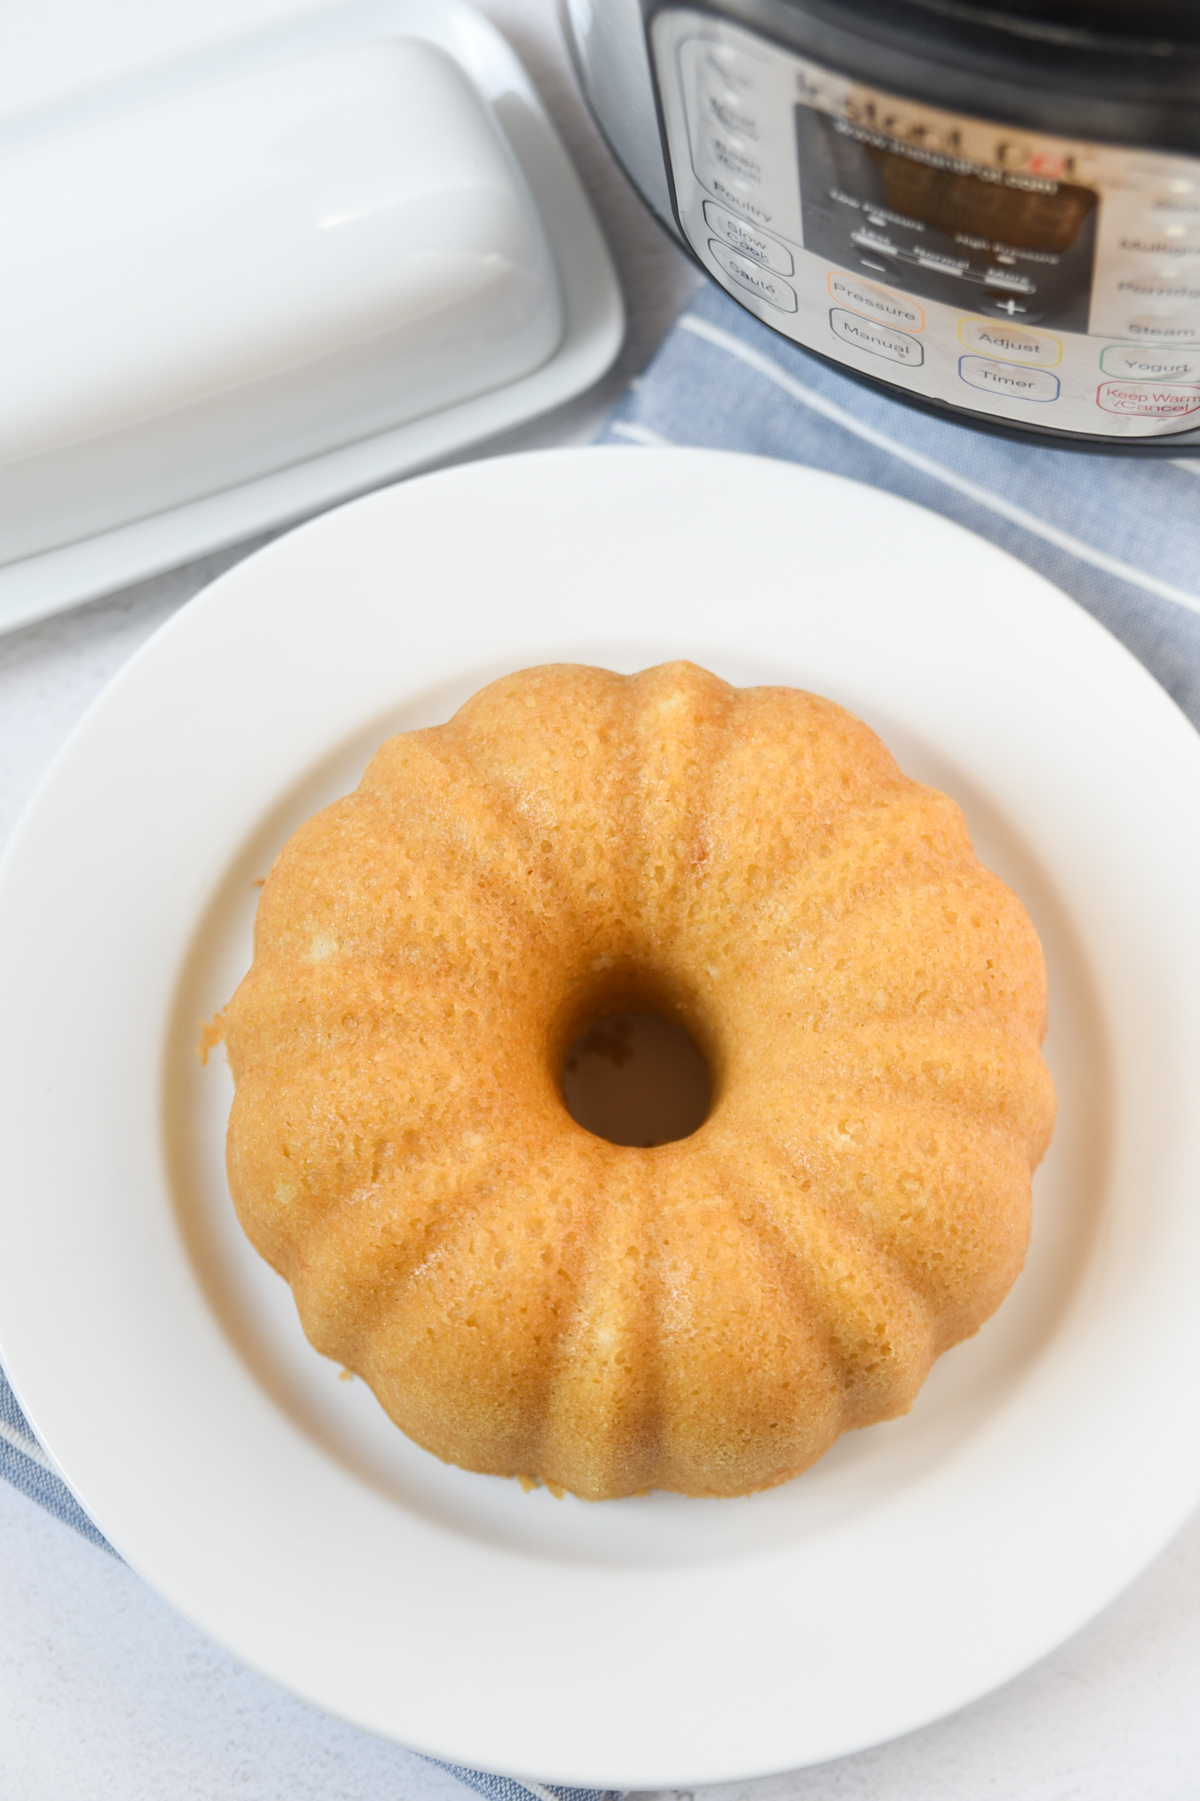 instant pot cornbread in bundt pan on a white plate